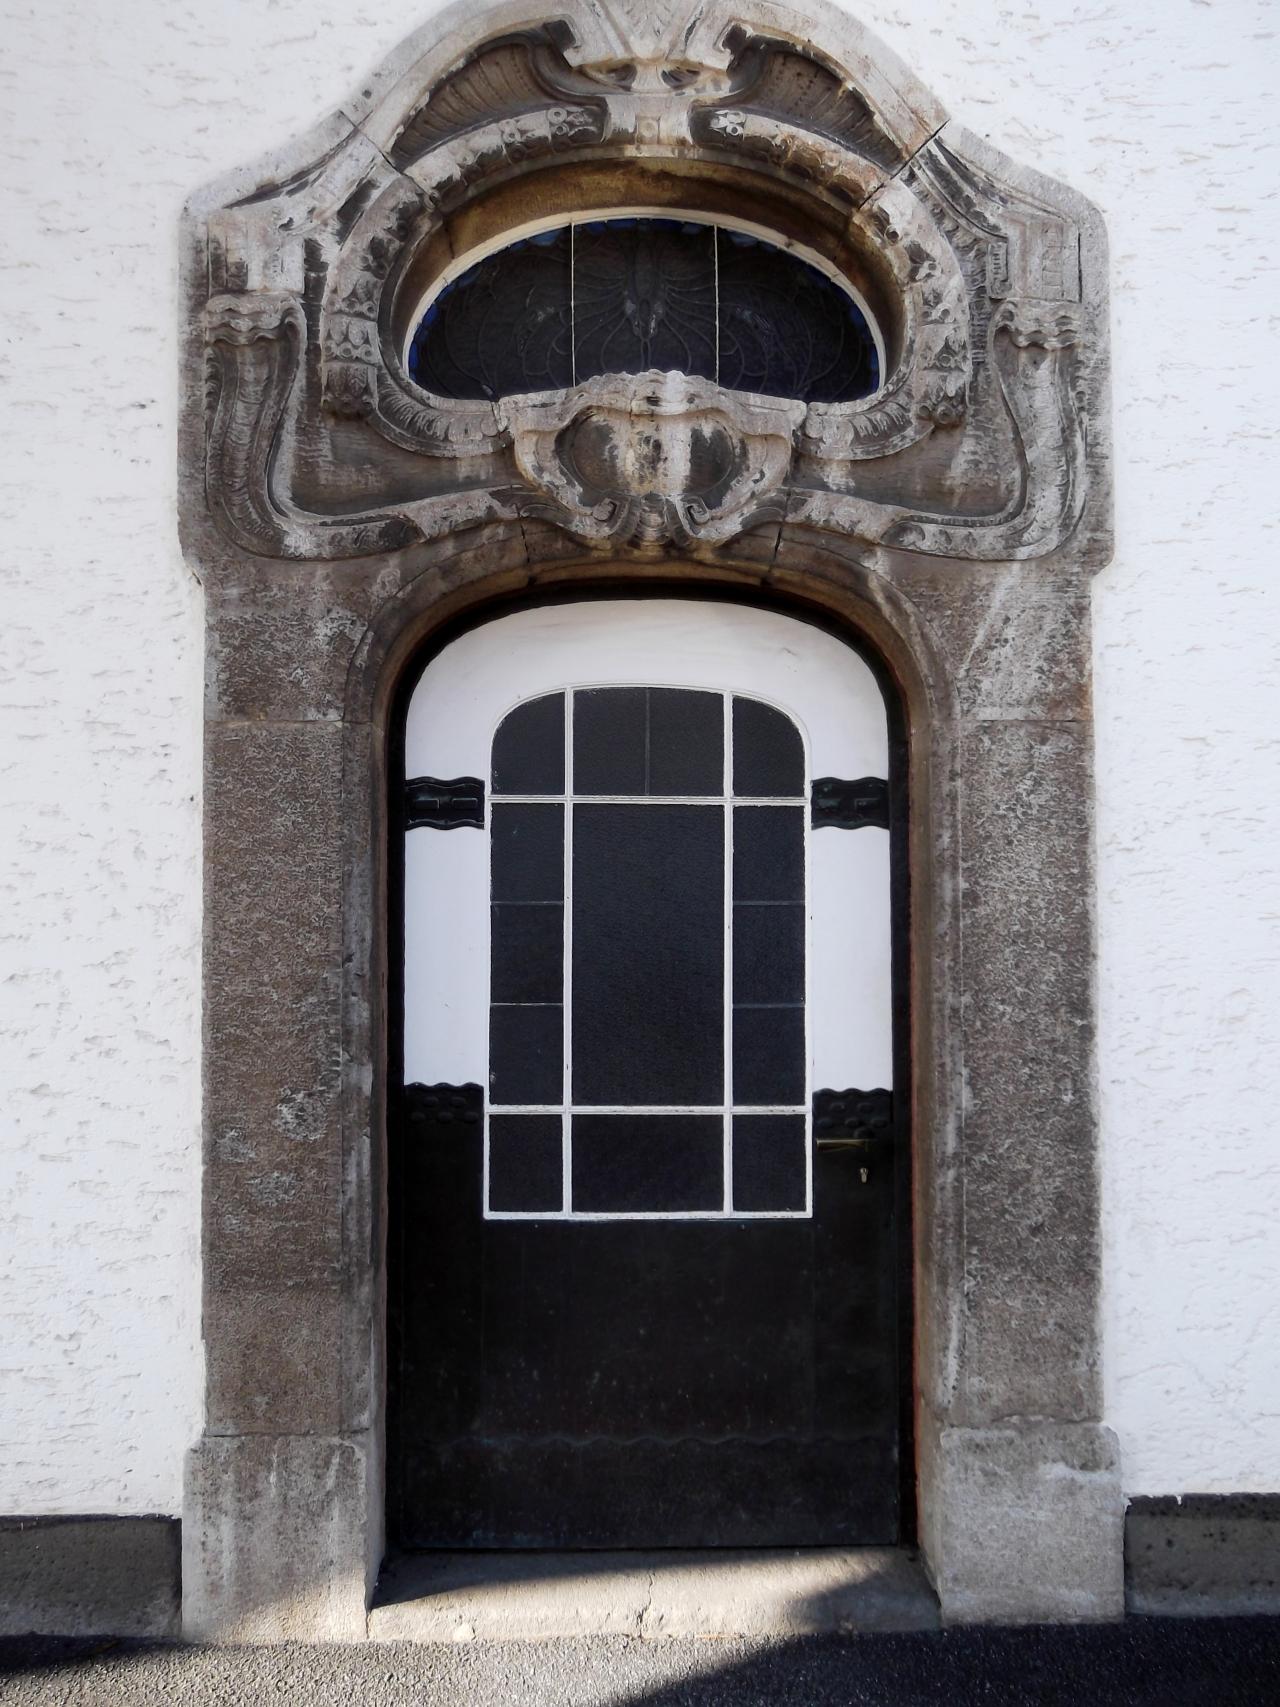 Art Nouveau (Jugendstil) Site Sprudelhof in Bad Nauheim,Germany.